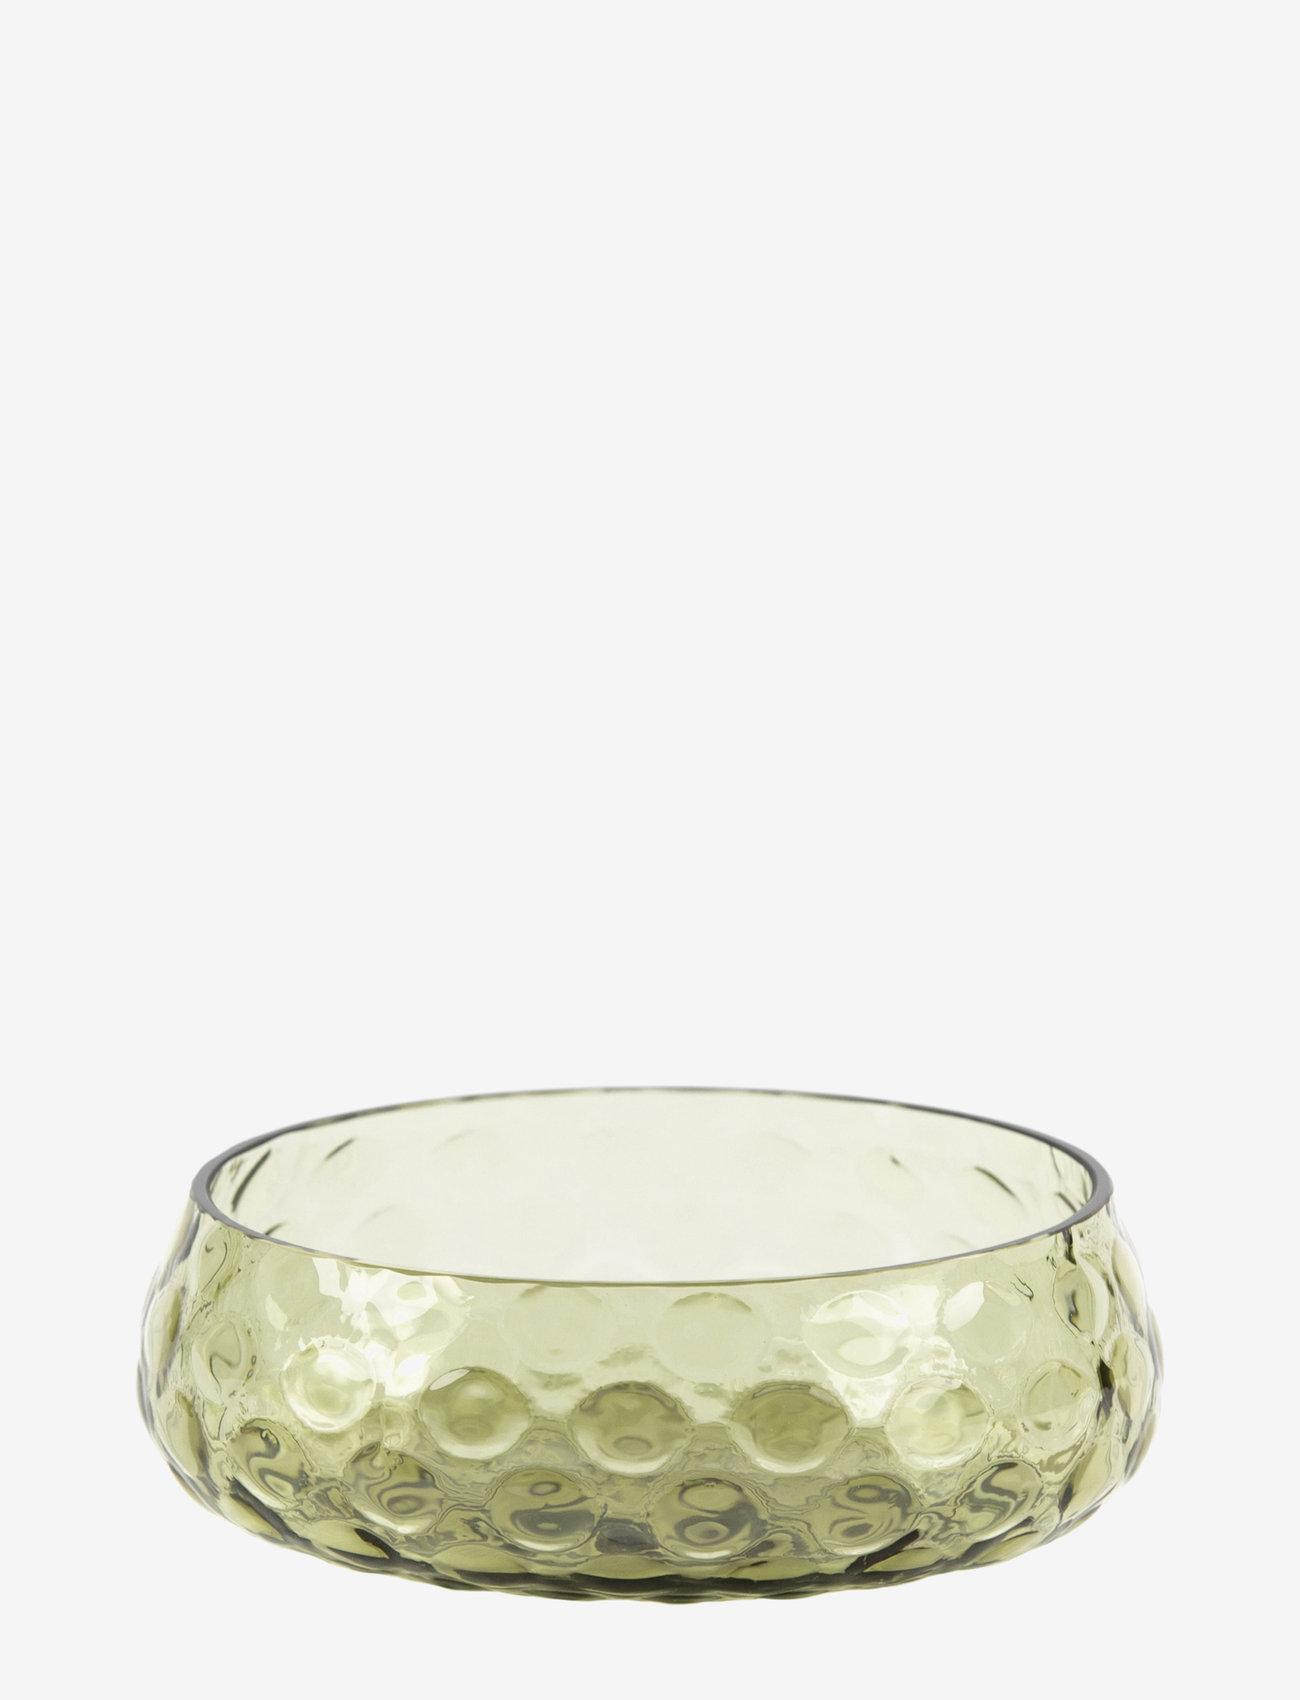 Kodanska - DANISH SUMMER BOWL - tarjoilukulhot - olive green - 0